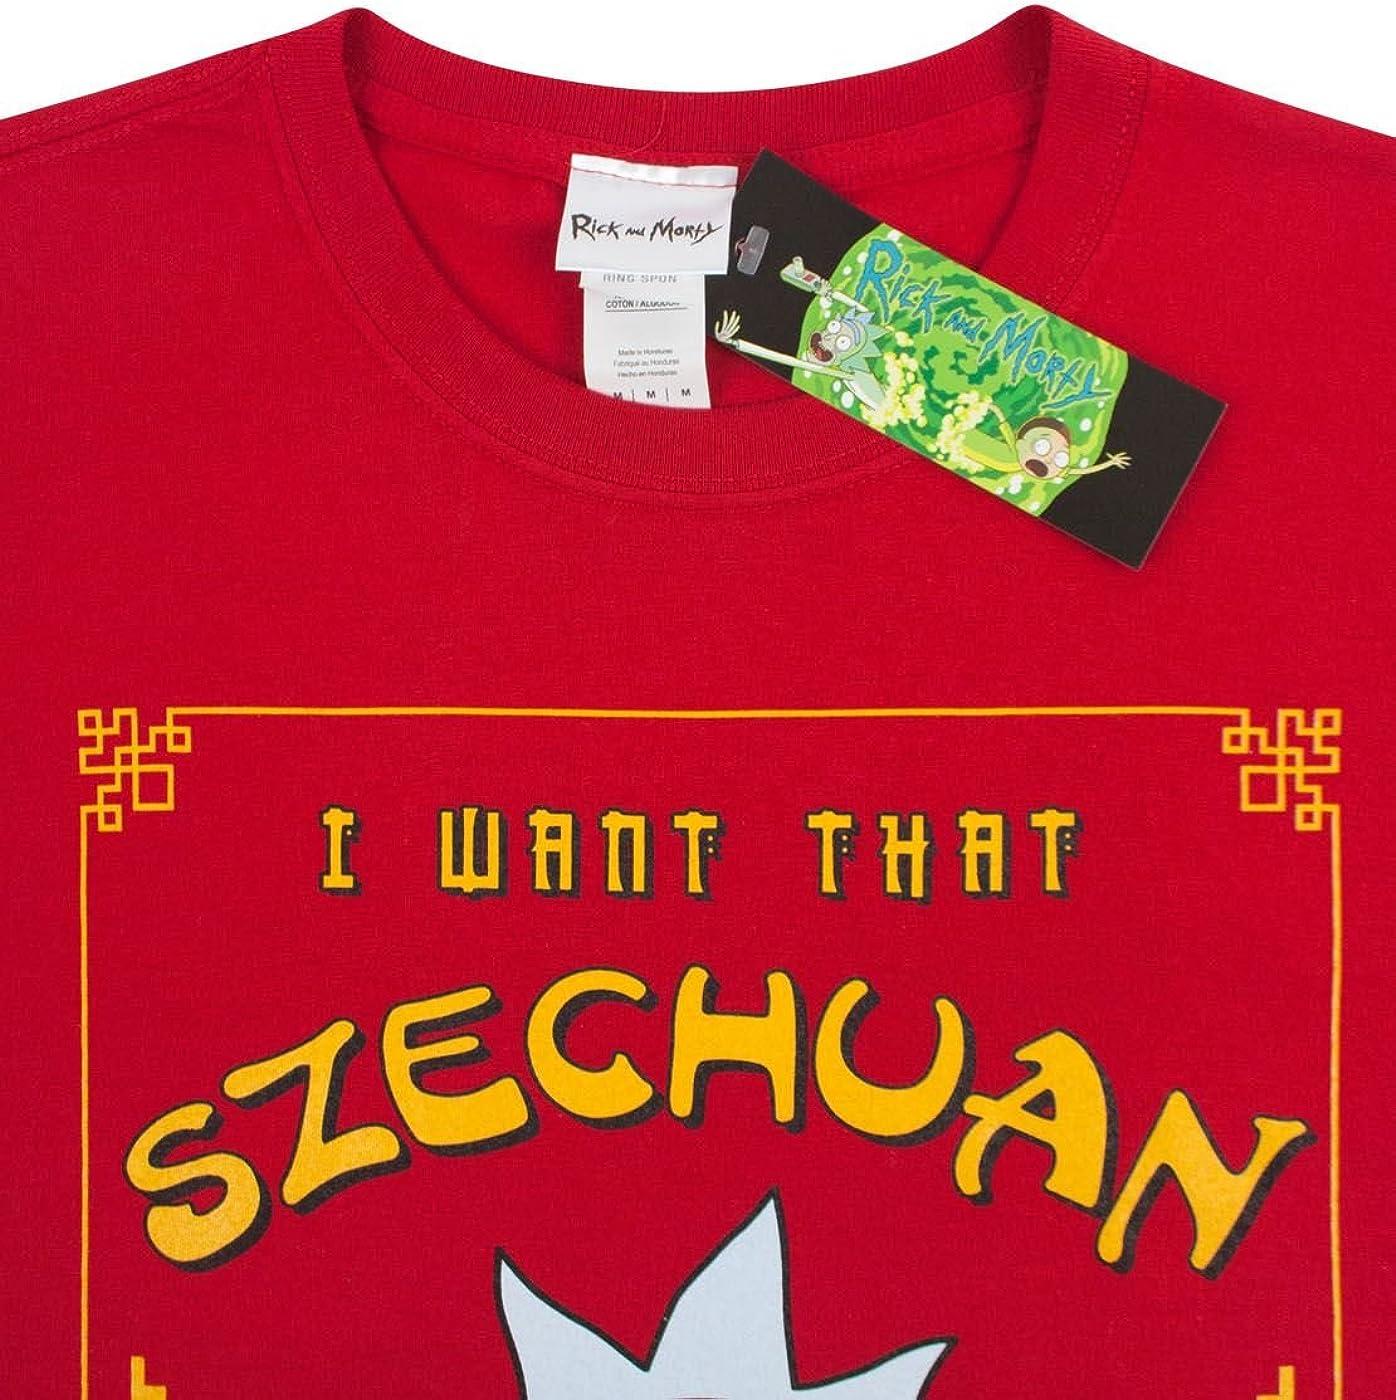 B07BR1DL1B RICK AND MORTY Pickle Rick Mr Meeseeks Citadel Szechuan Sauce Men's T-Shirt (S - XXL) 61oAe3cwK1L